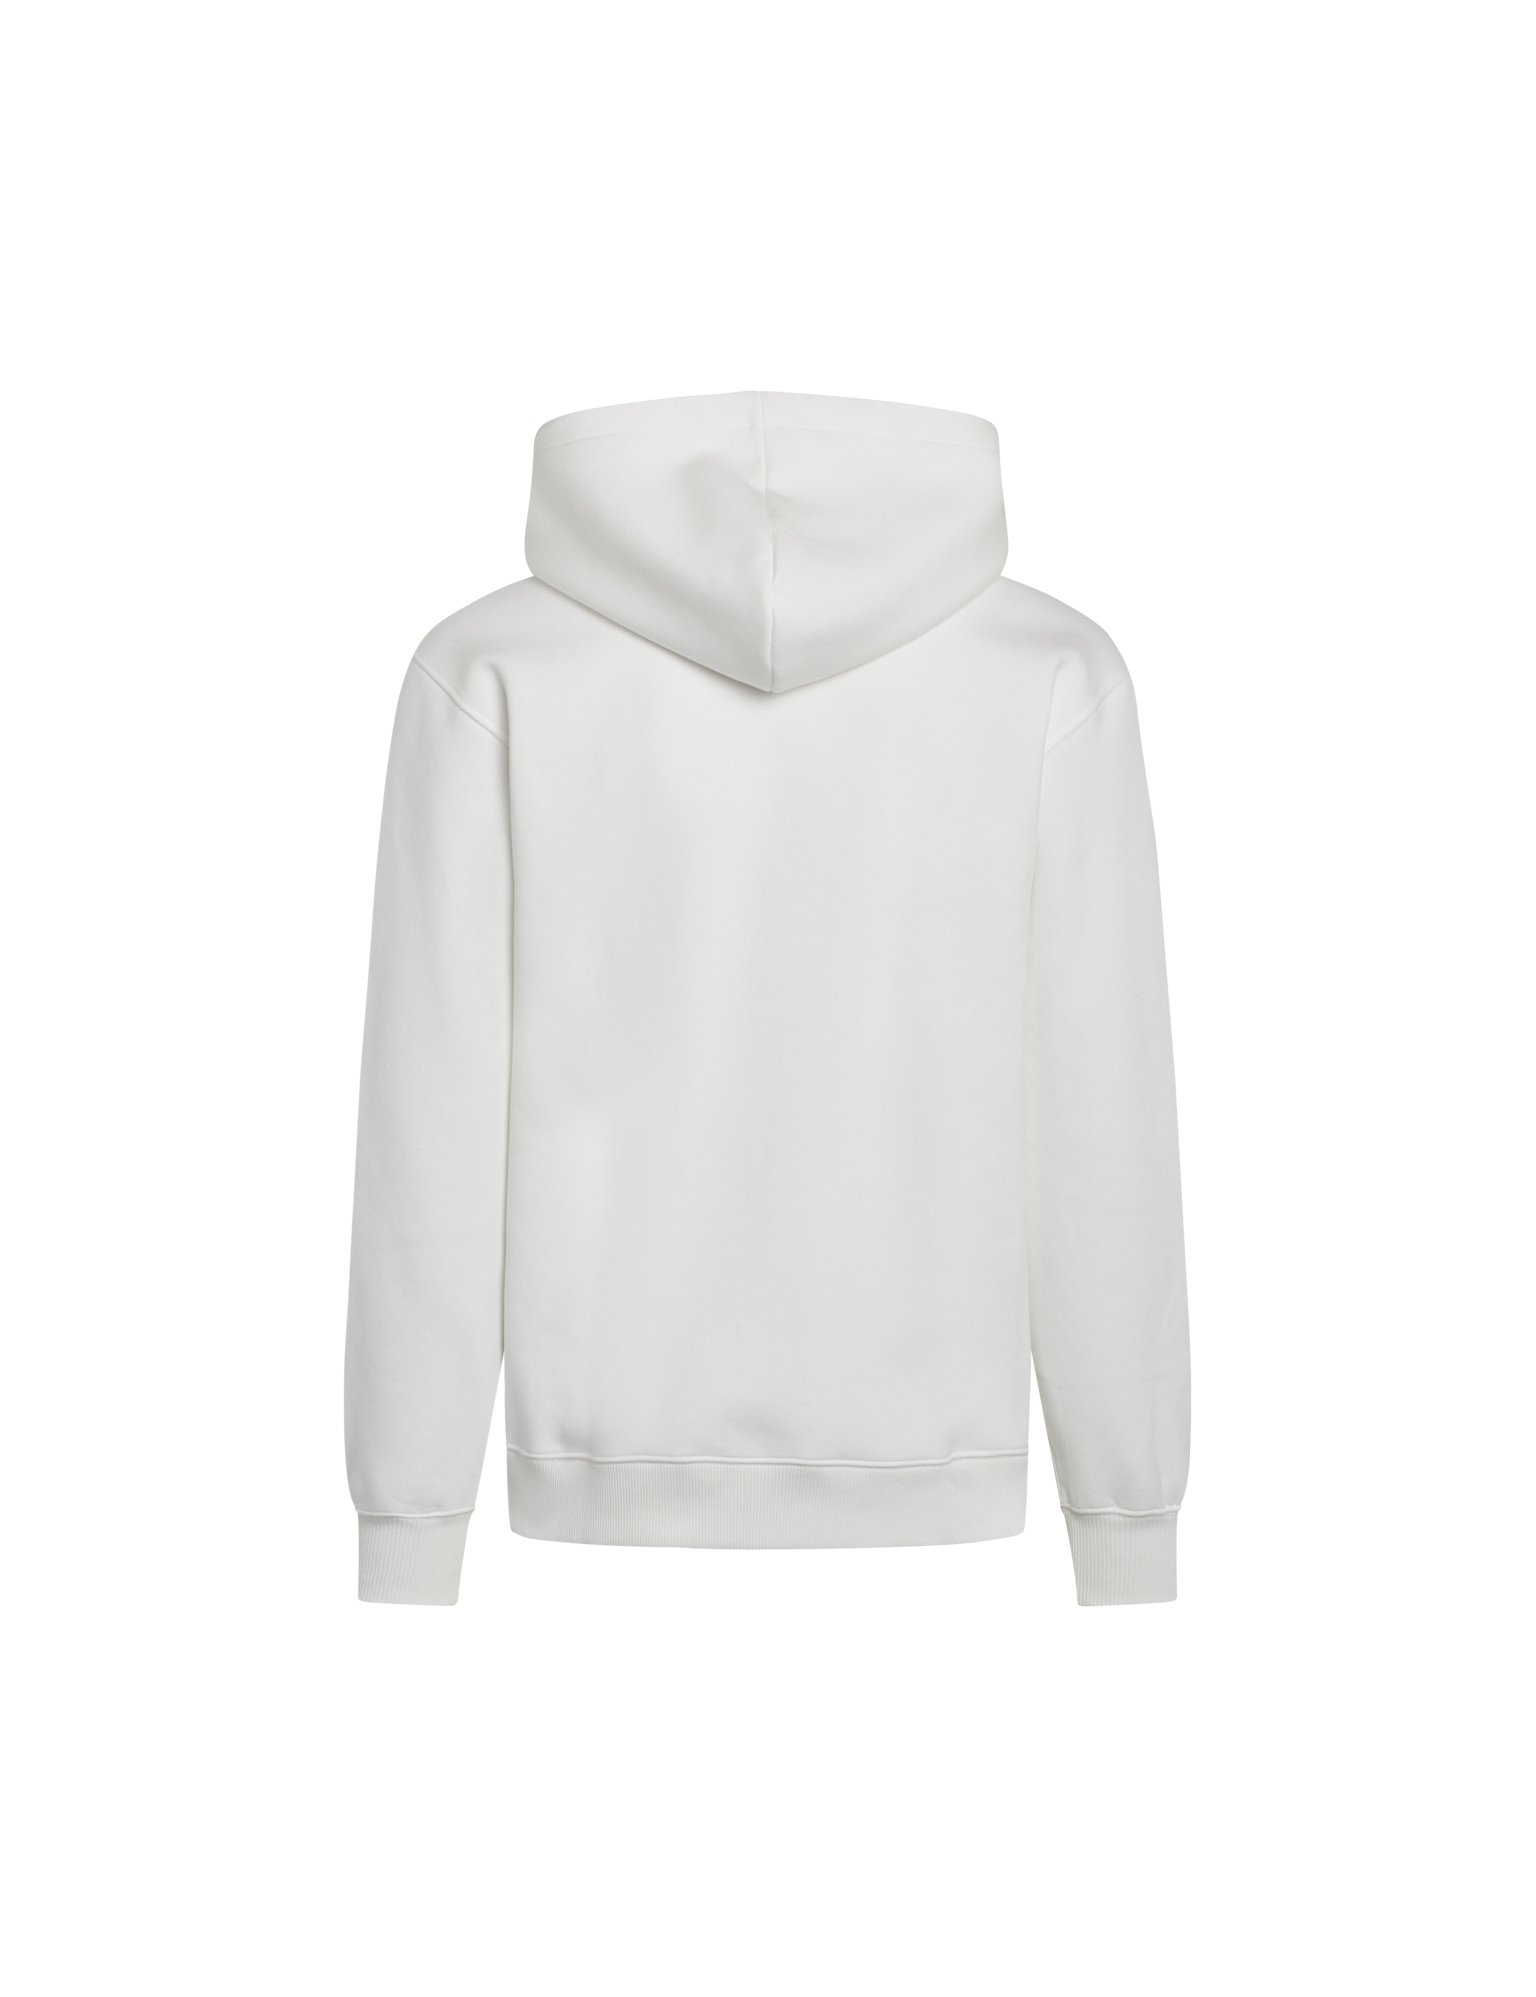 Mads Nørgaard New Standard logo hoodie, marshmallow, xx-large